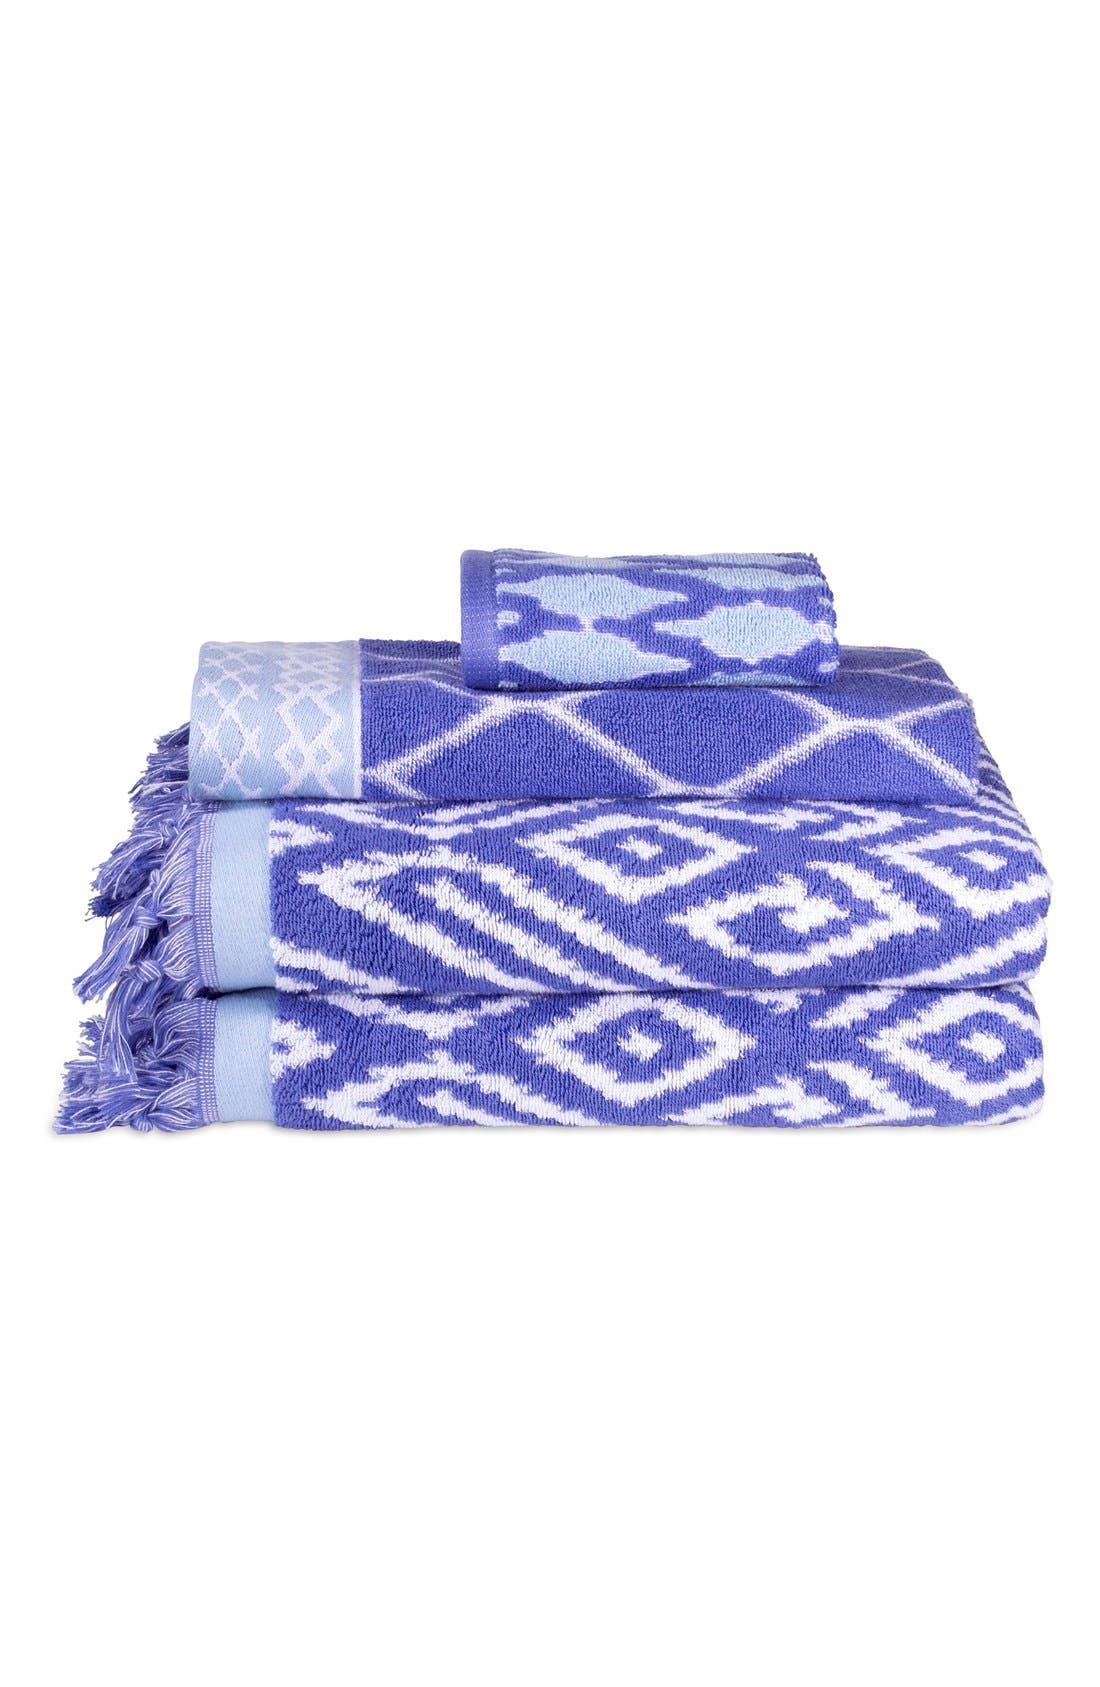 John Robshaw 'Kalasin' Turkish Cotton Bath Towel